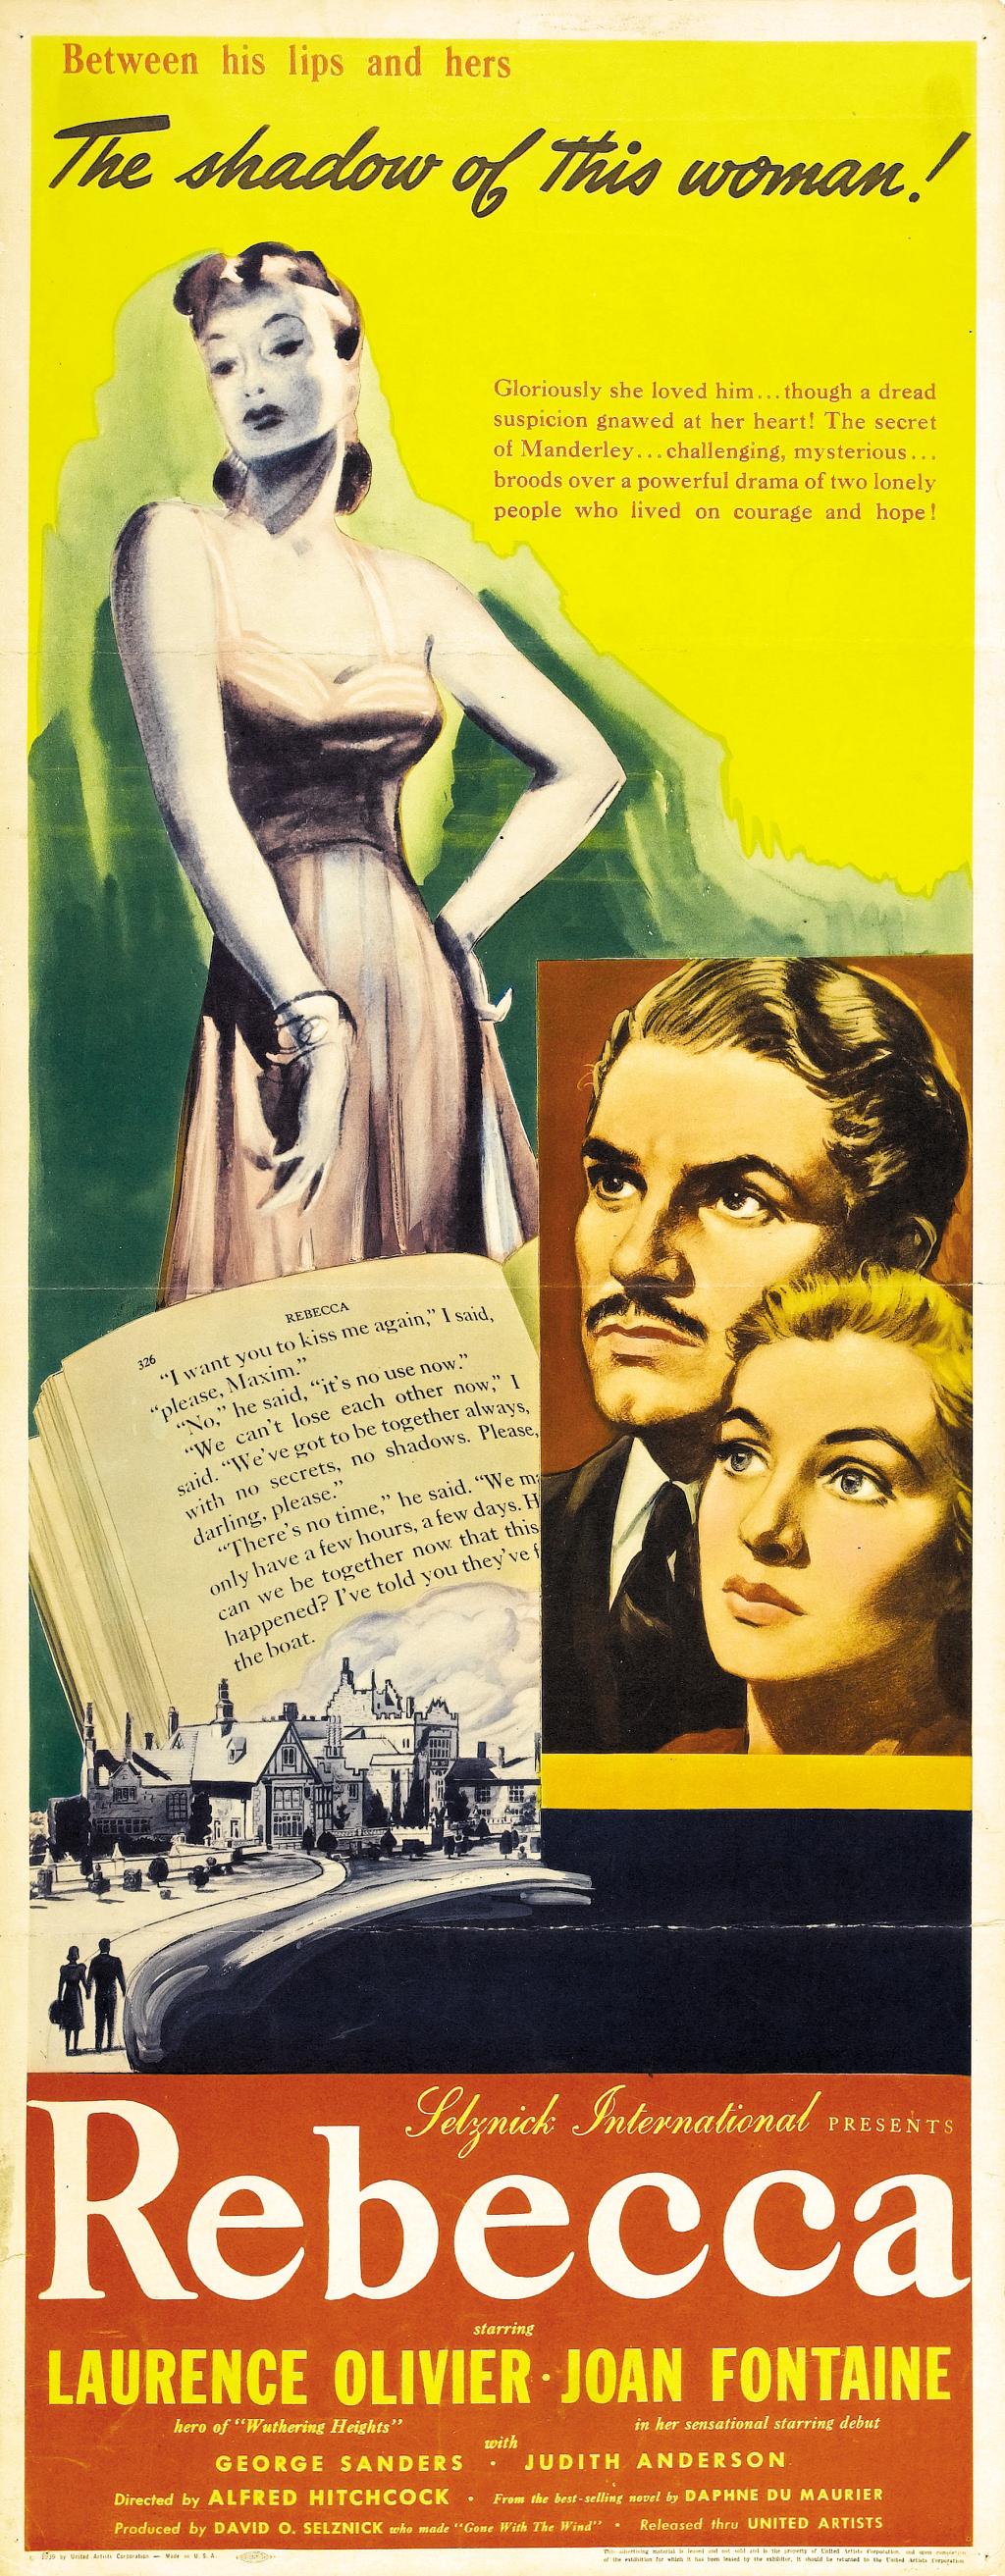 Rebecca (1940, dir. Alfred Hitchcock) US insert poster